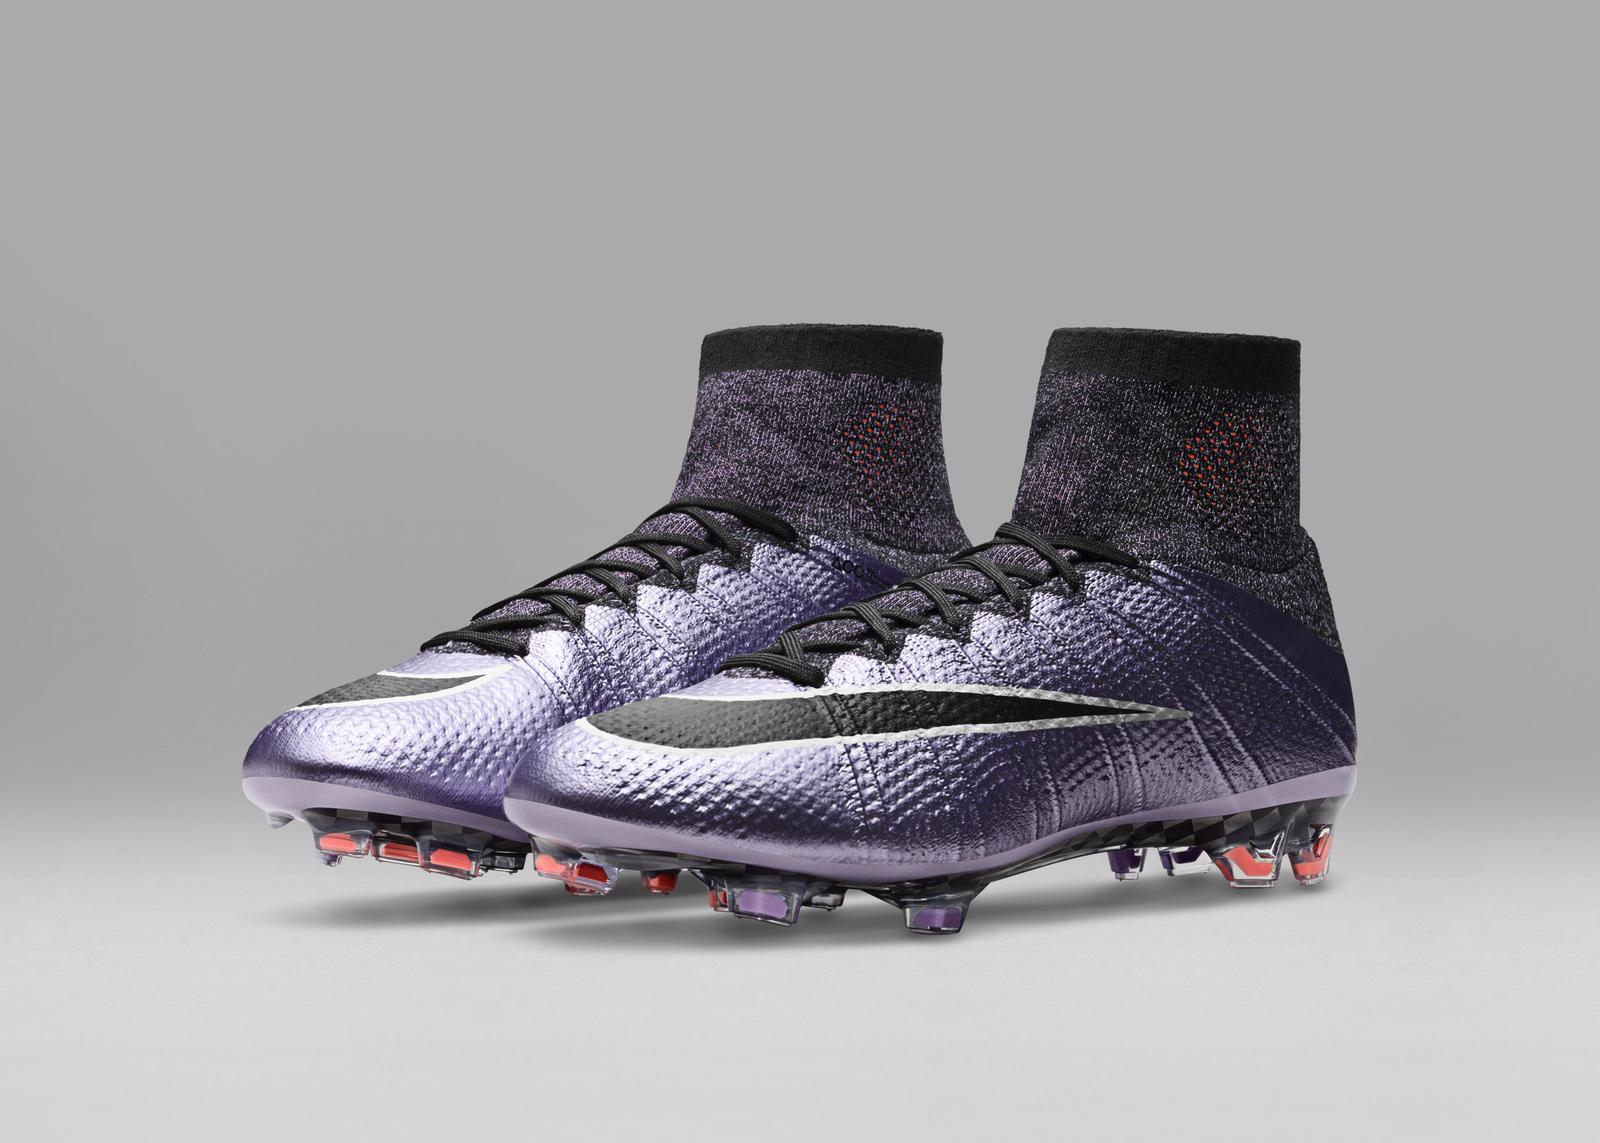 buy online 0519e 691d1 Urban Lilac Mercurial.  Nike Football LIQUID CHROME MERCURIAL SUPERFLY FG 641858 580 E.  Nike Football LIQUID CHROME MERCURIAL SUPERFLY FG 641858 580 D